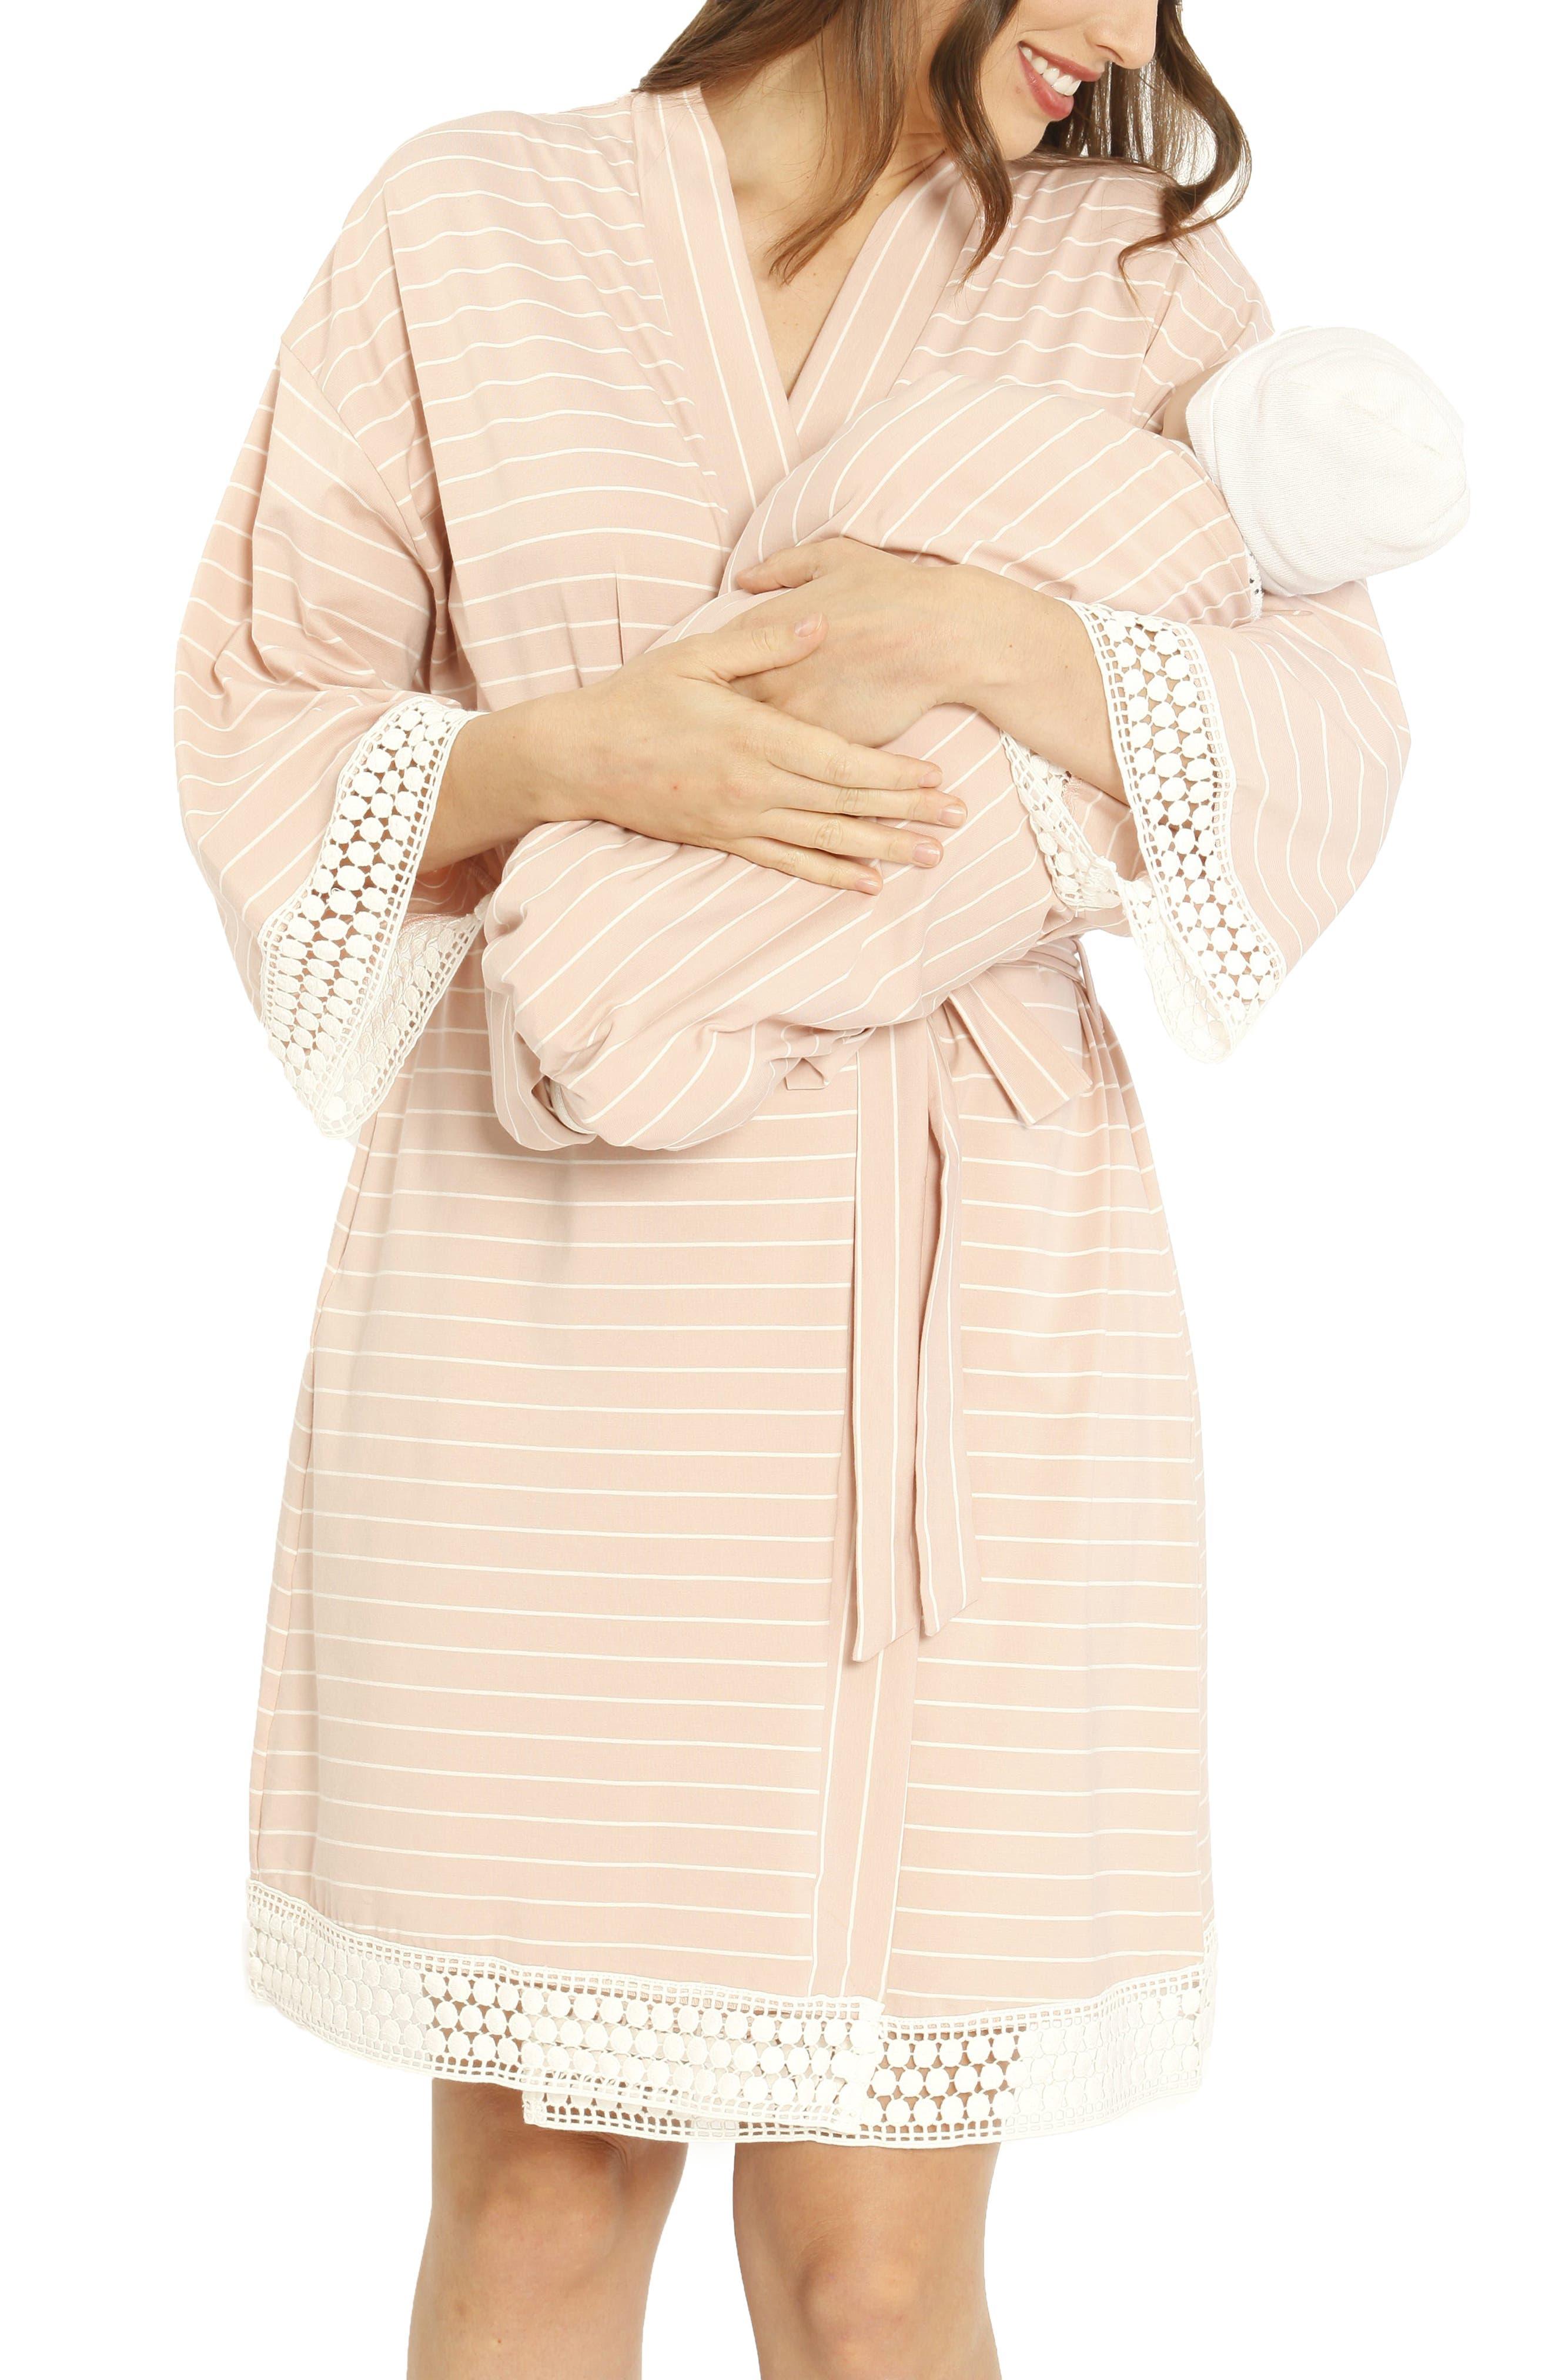 Angel Maternity Ruby Maternity/nursing Sleep Shirt, Robe & Baby Blanket Set, /XX-Large - Pink